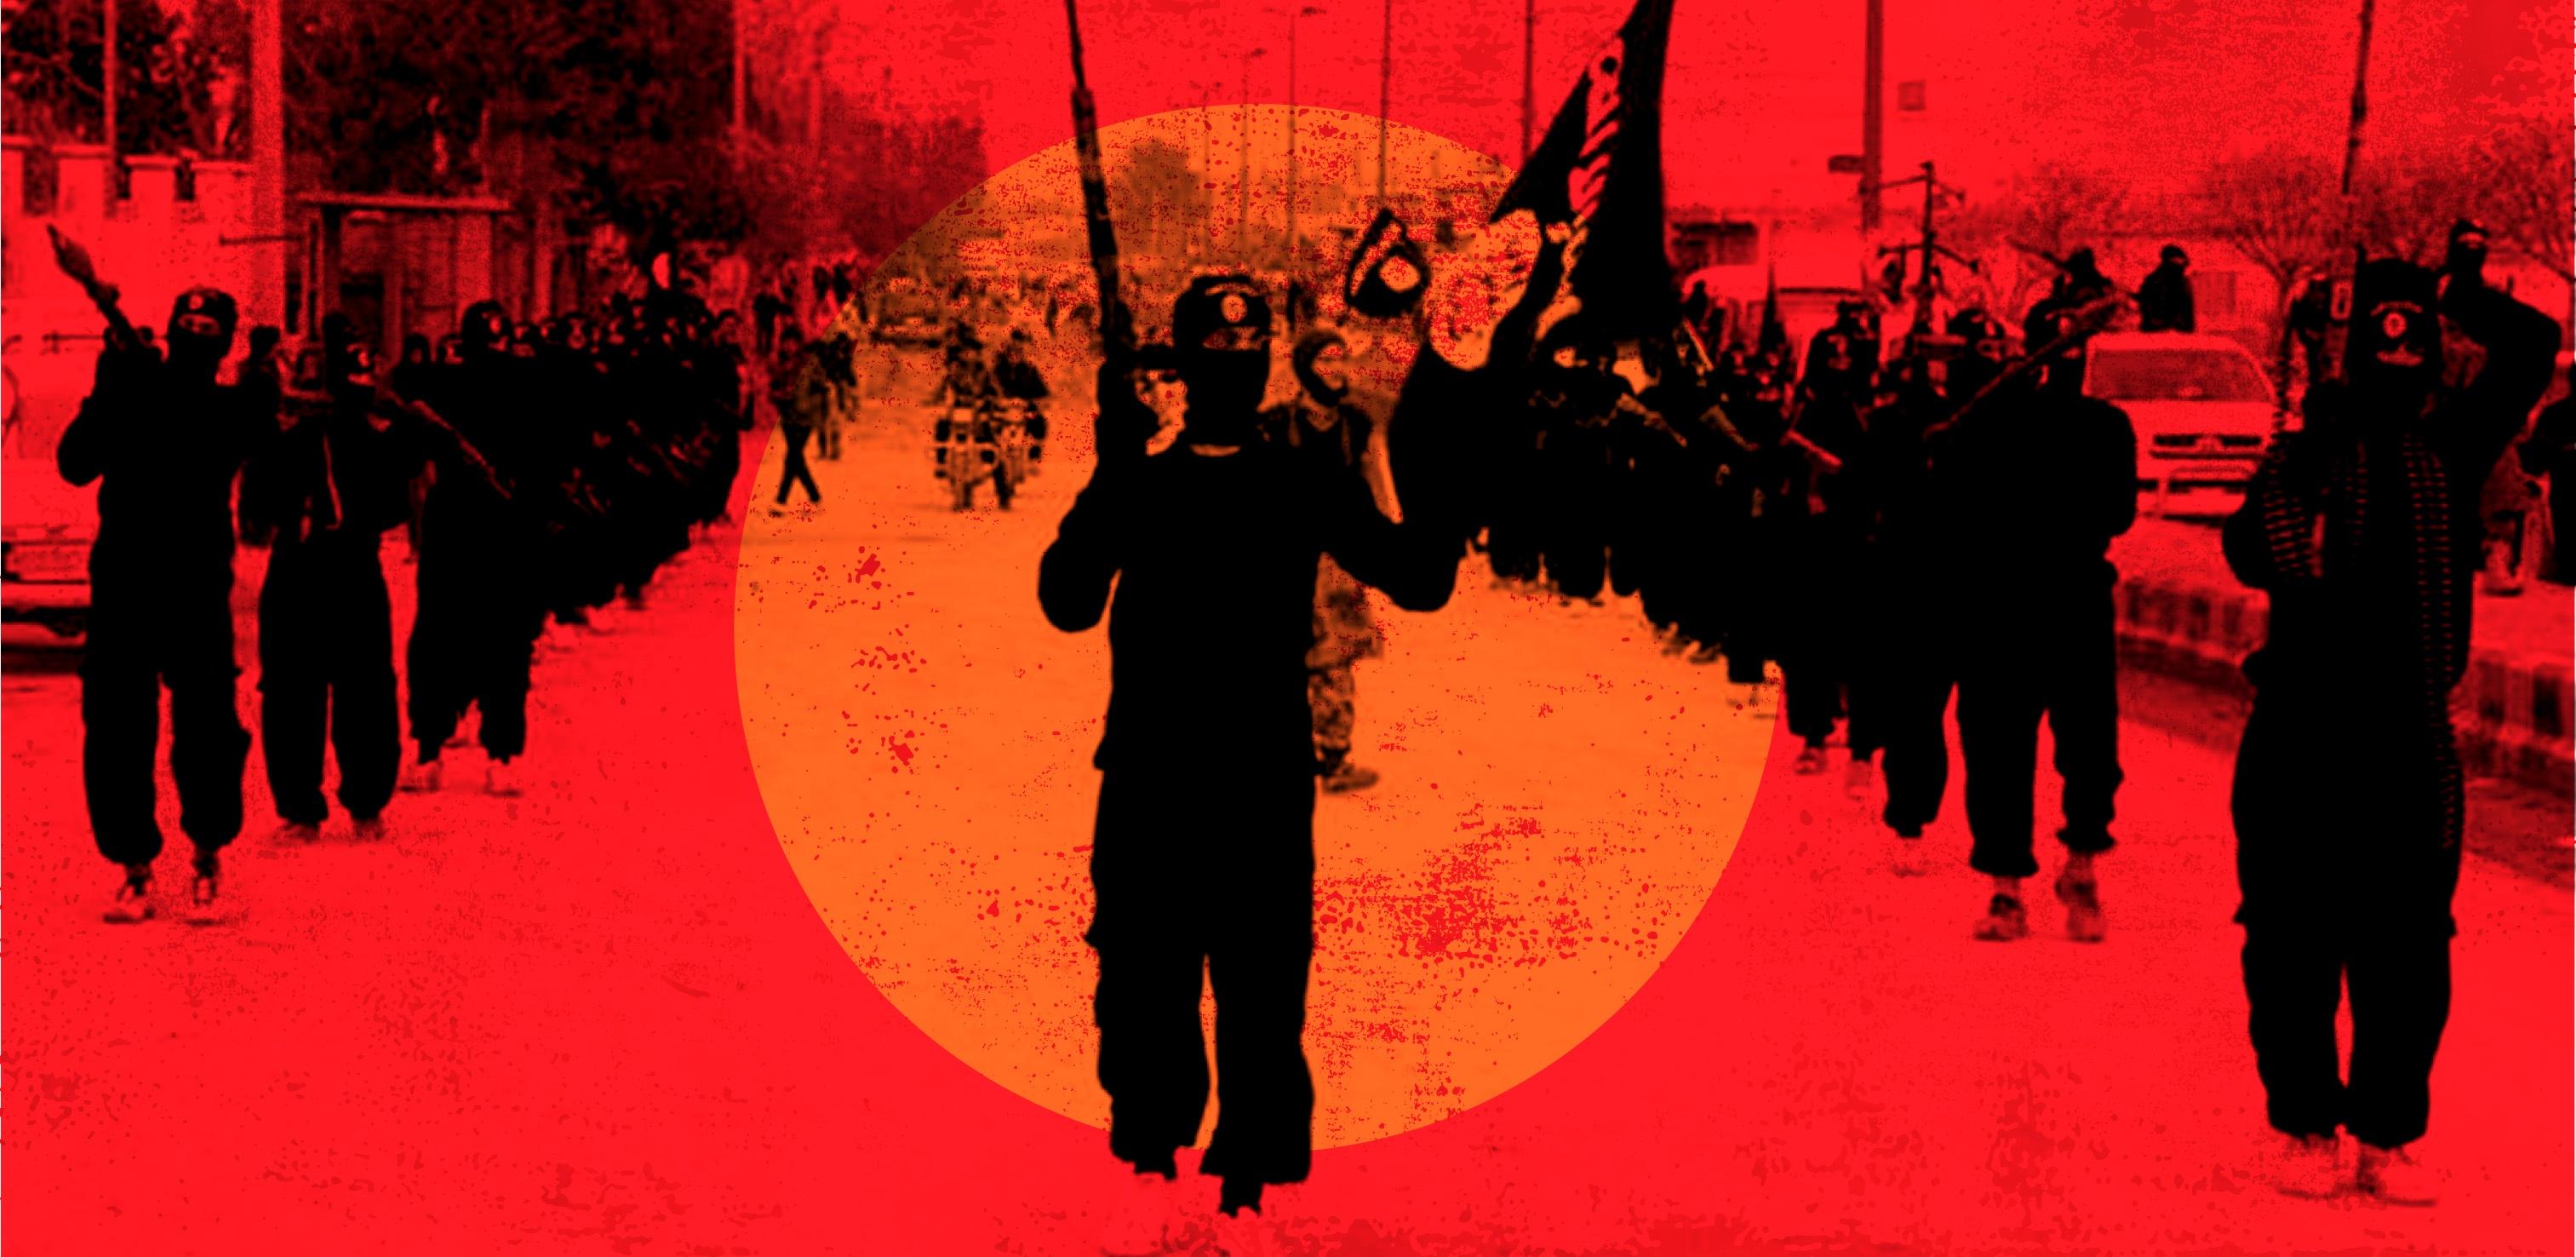 http://cdn.theatlantic.com/assets/media/img/2015/02/17/ISIS_Web_feature2/lead.jpg